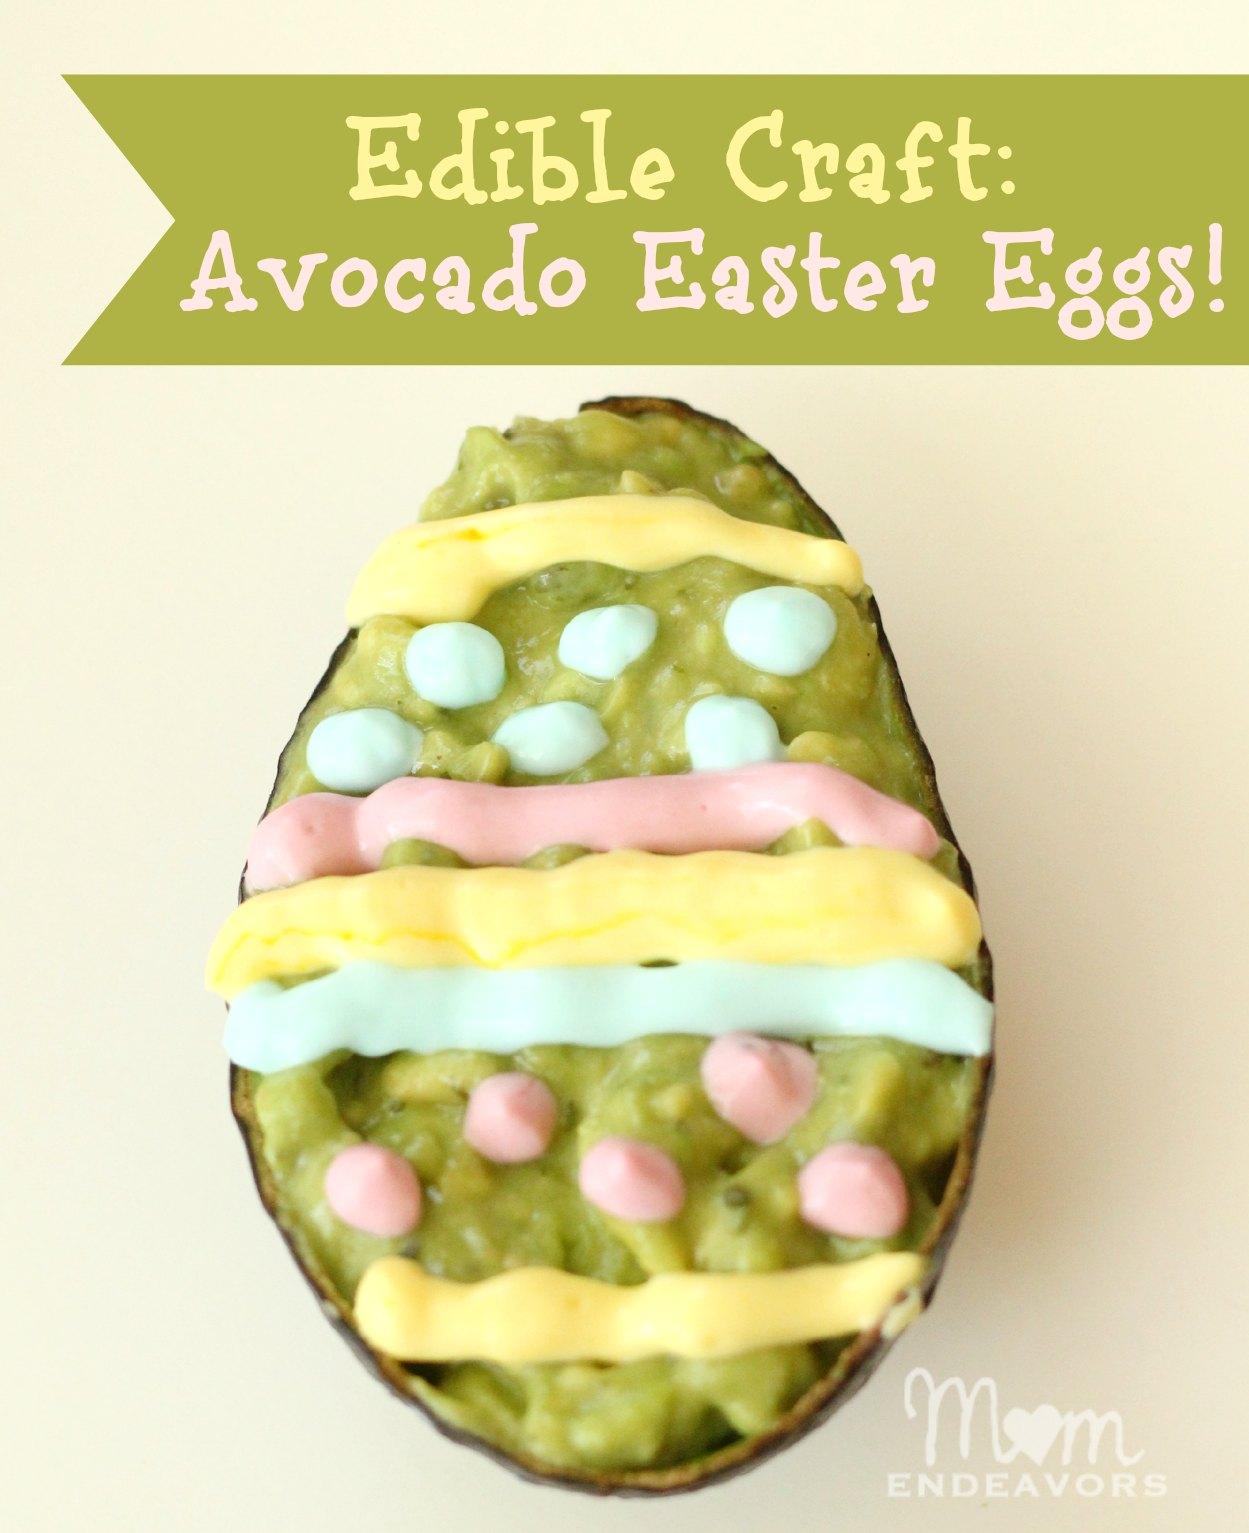 Avocado Easter Eggs